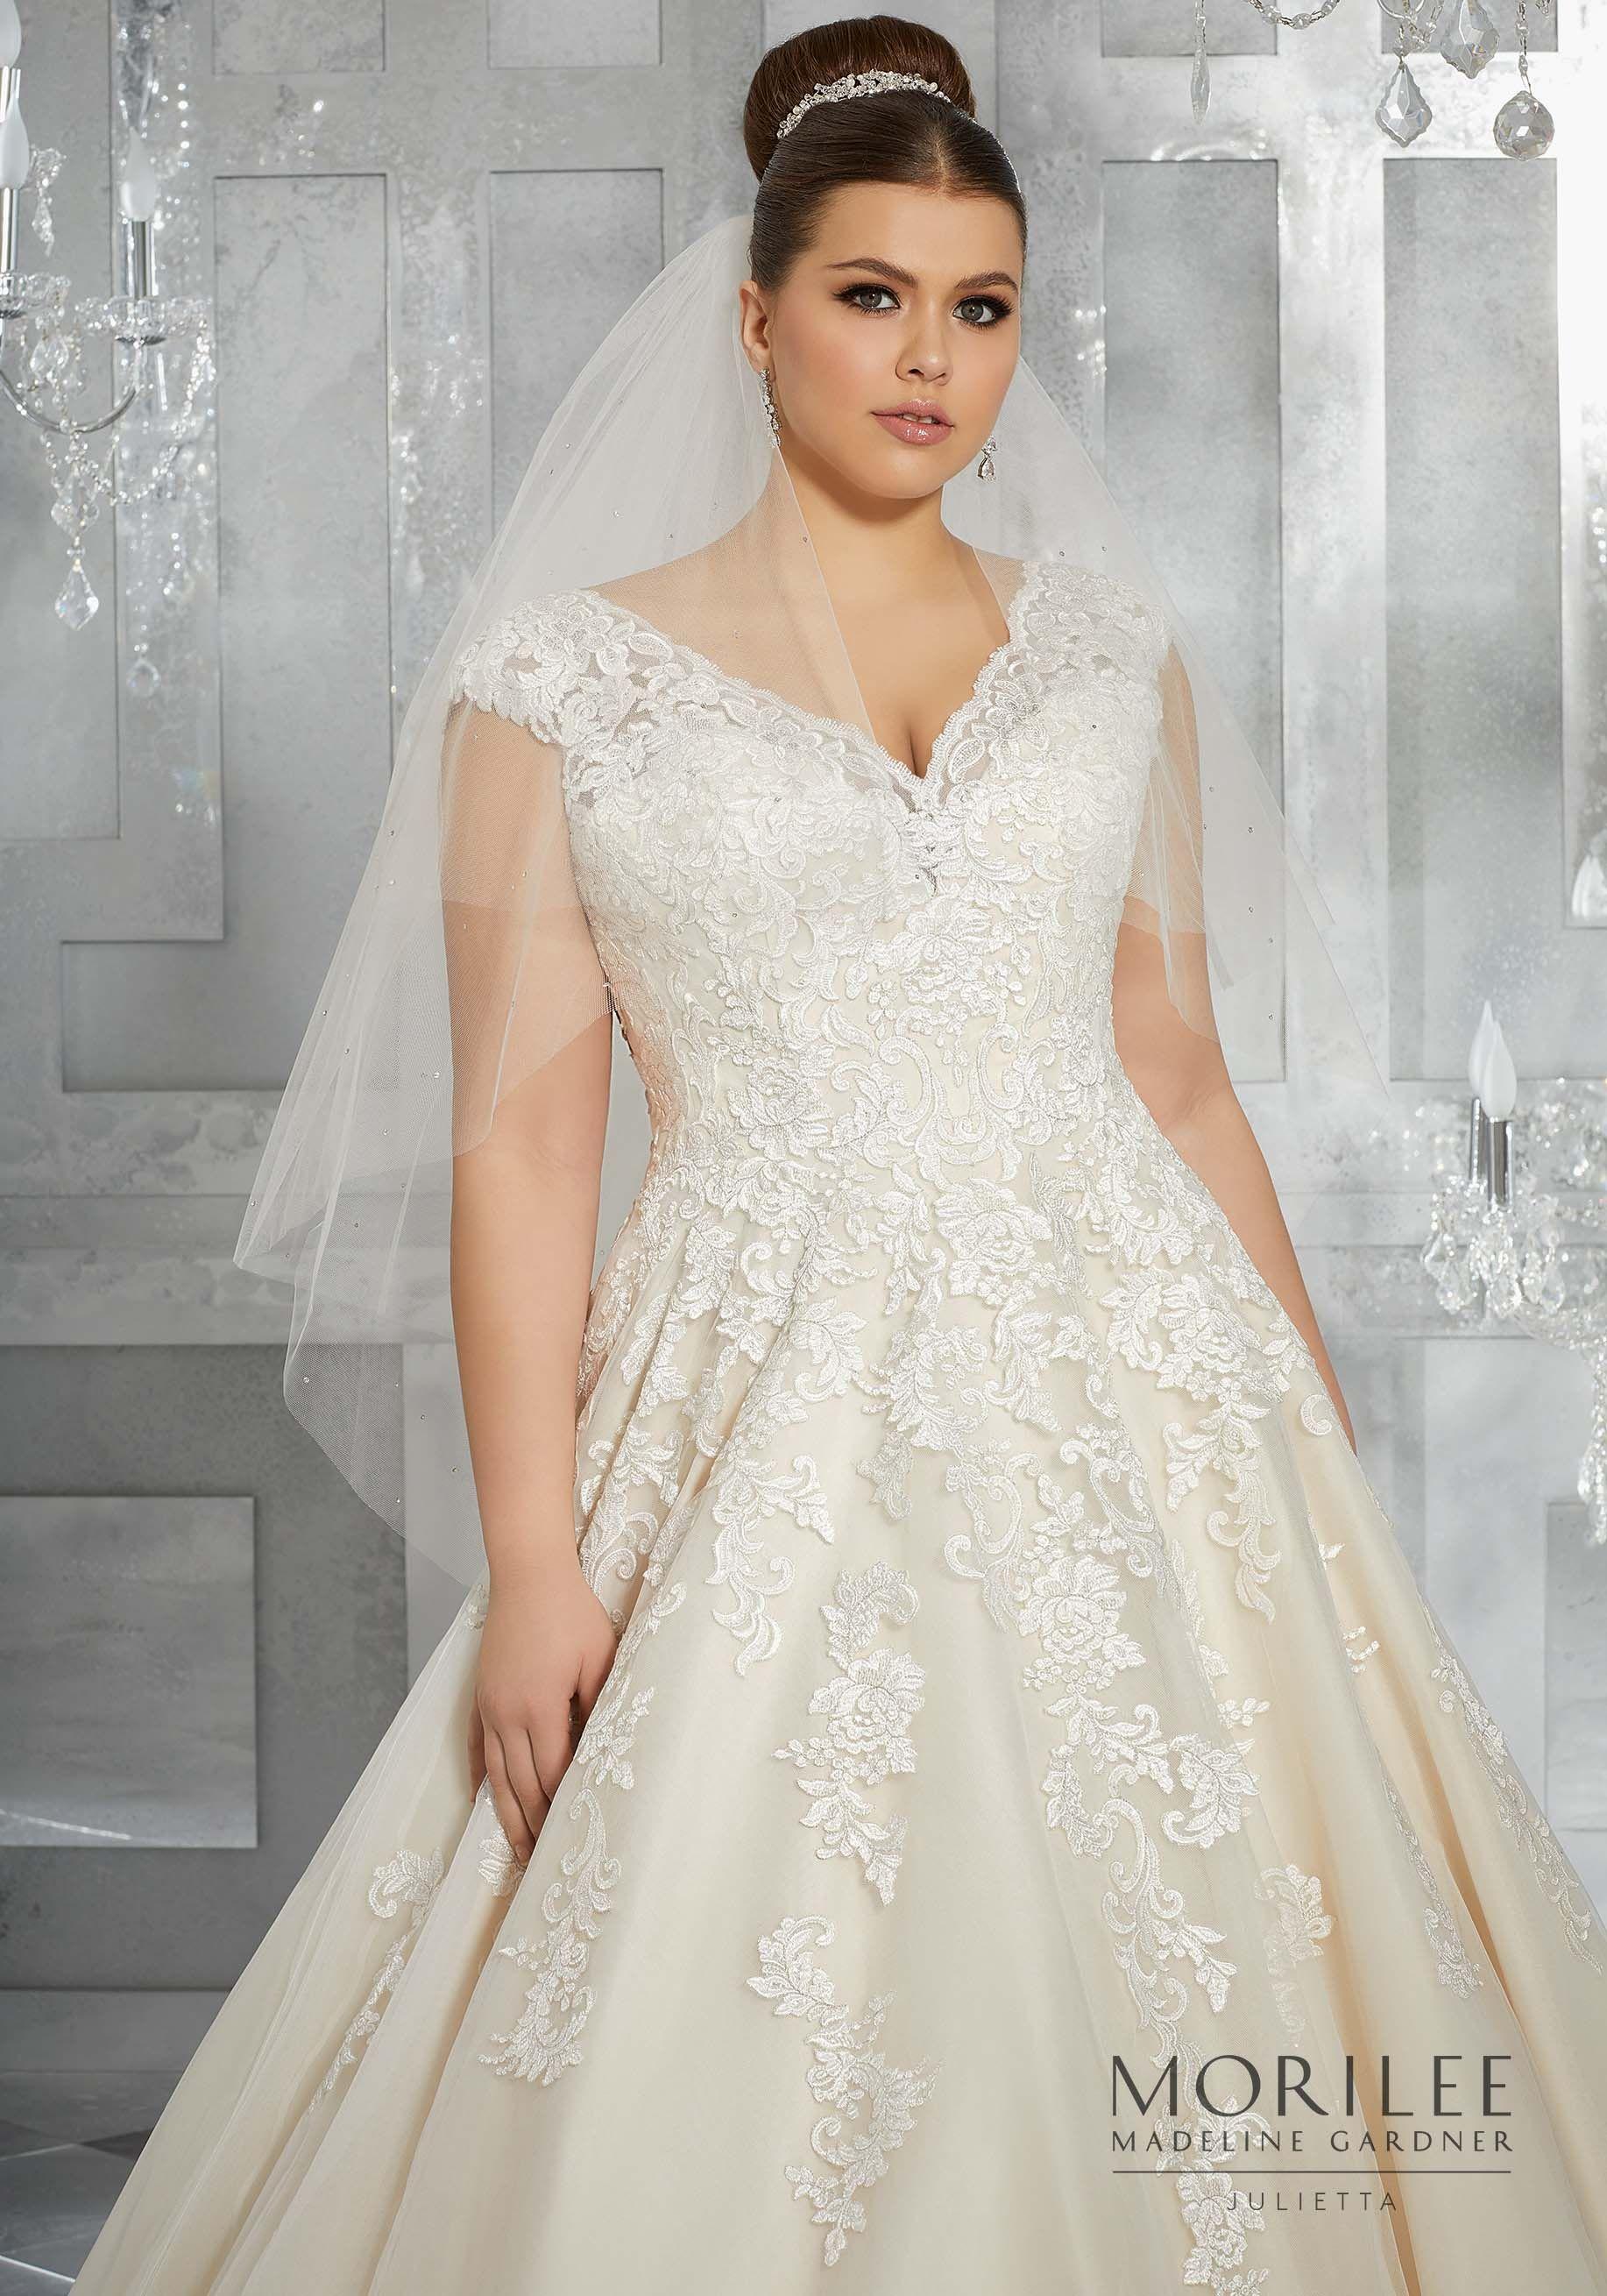 Plus size tulle wedding dress  Morilee  Madeline Gardner Moiselle Plus Size Wedding Dress